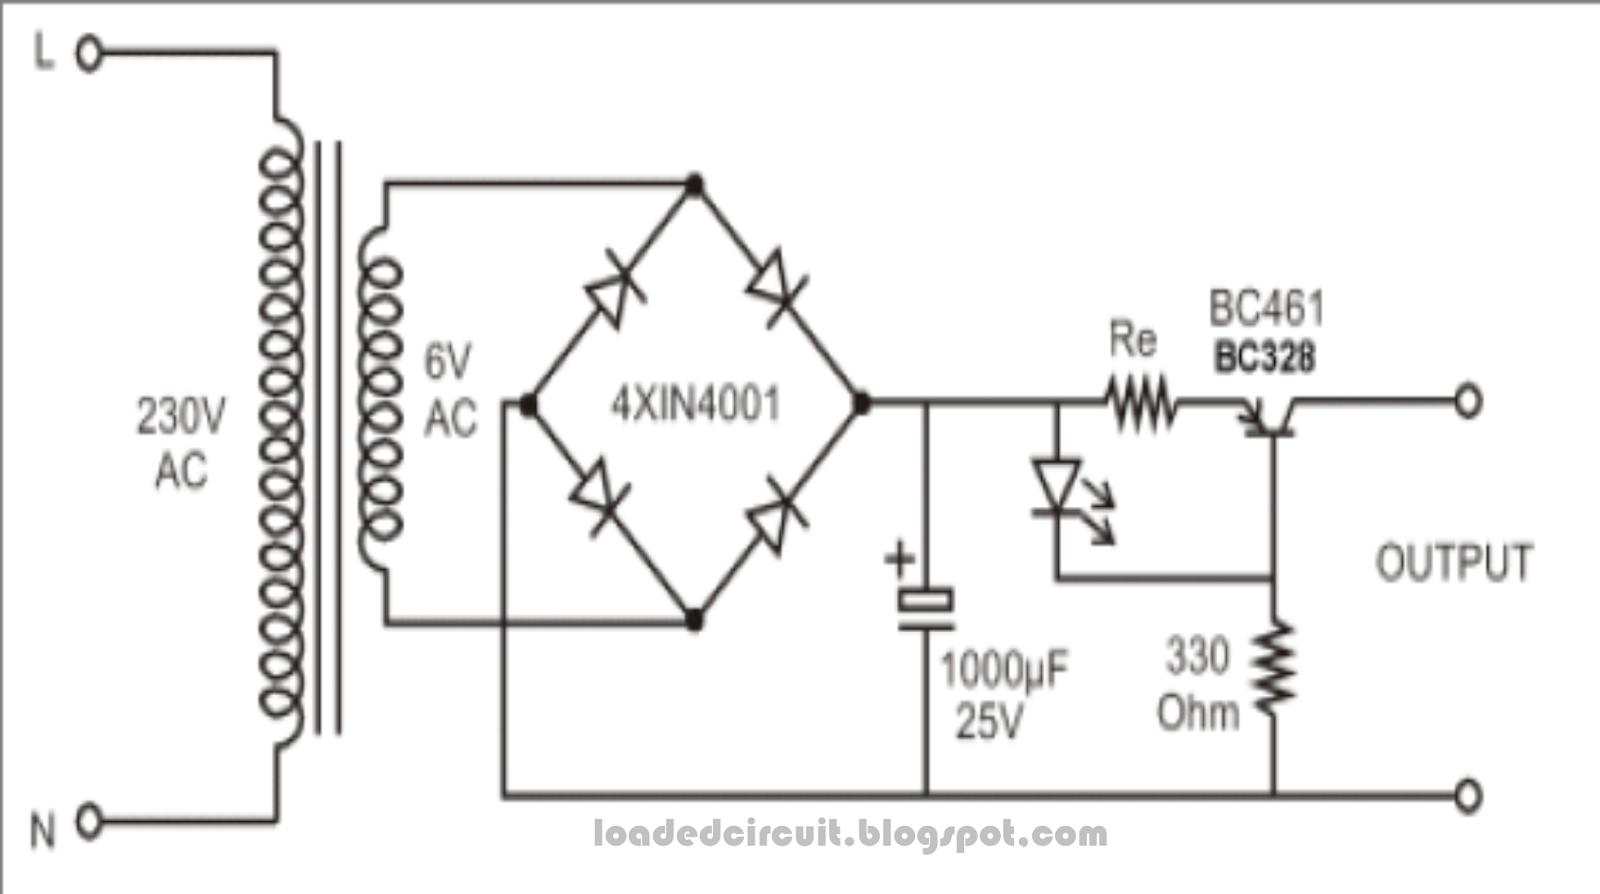 com circuitdiagram remotecontrolcircuit theconstantcurrentsource